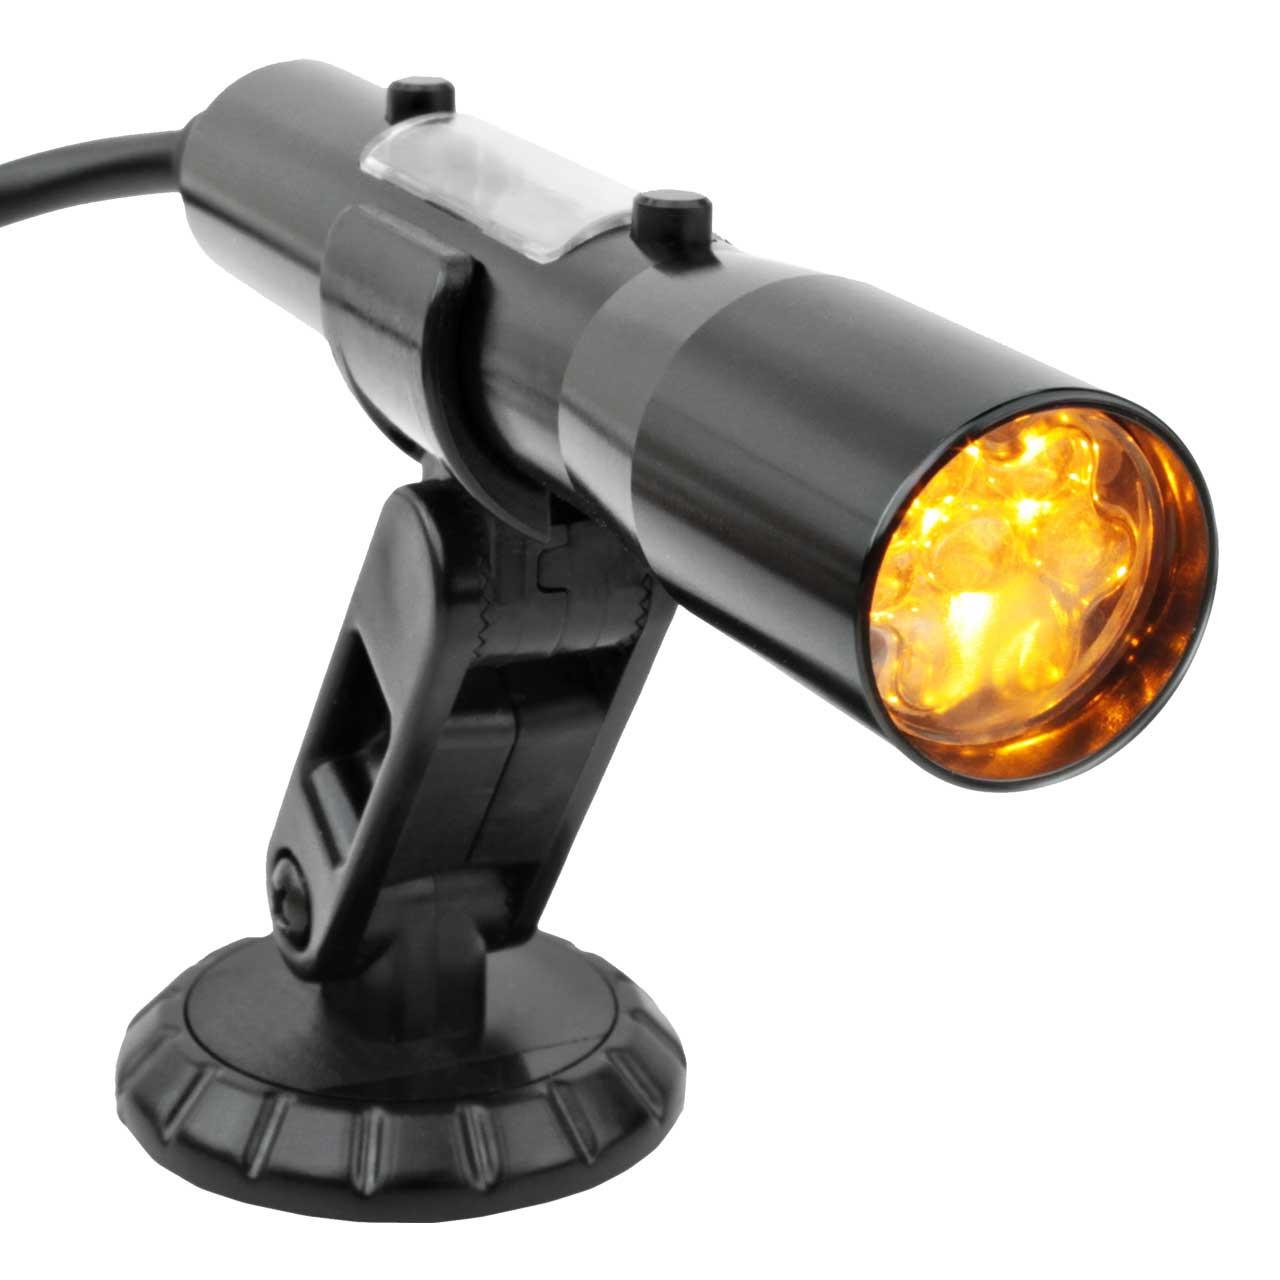 SST Shift Light - Yellow LEDs with Black Aluminum Tube (Smart-Shift Technology)